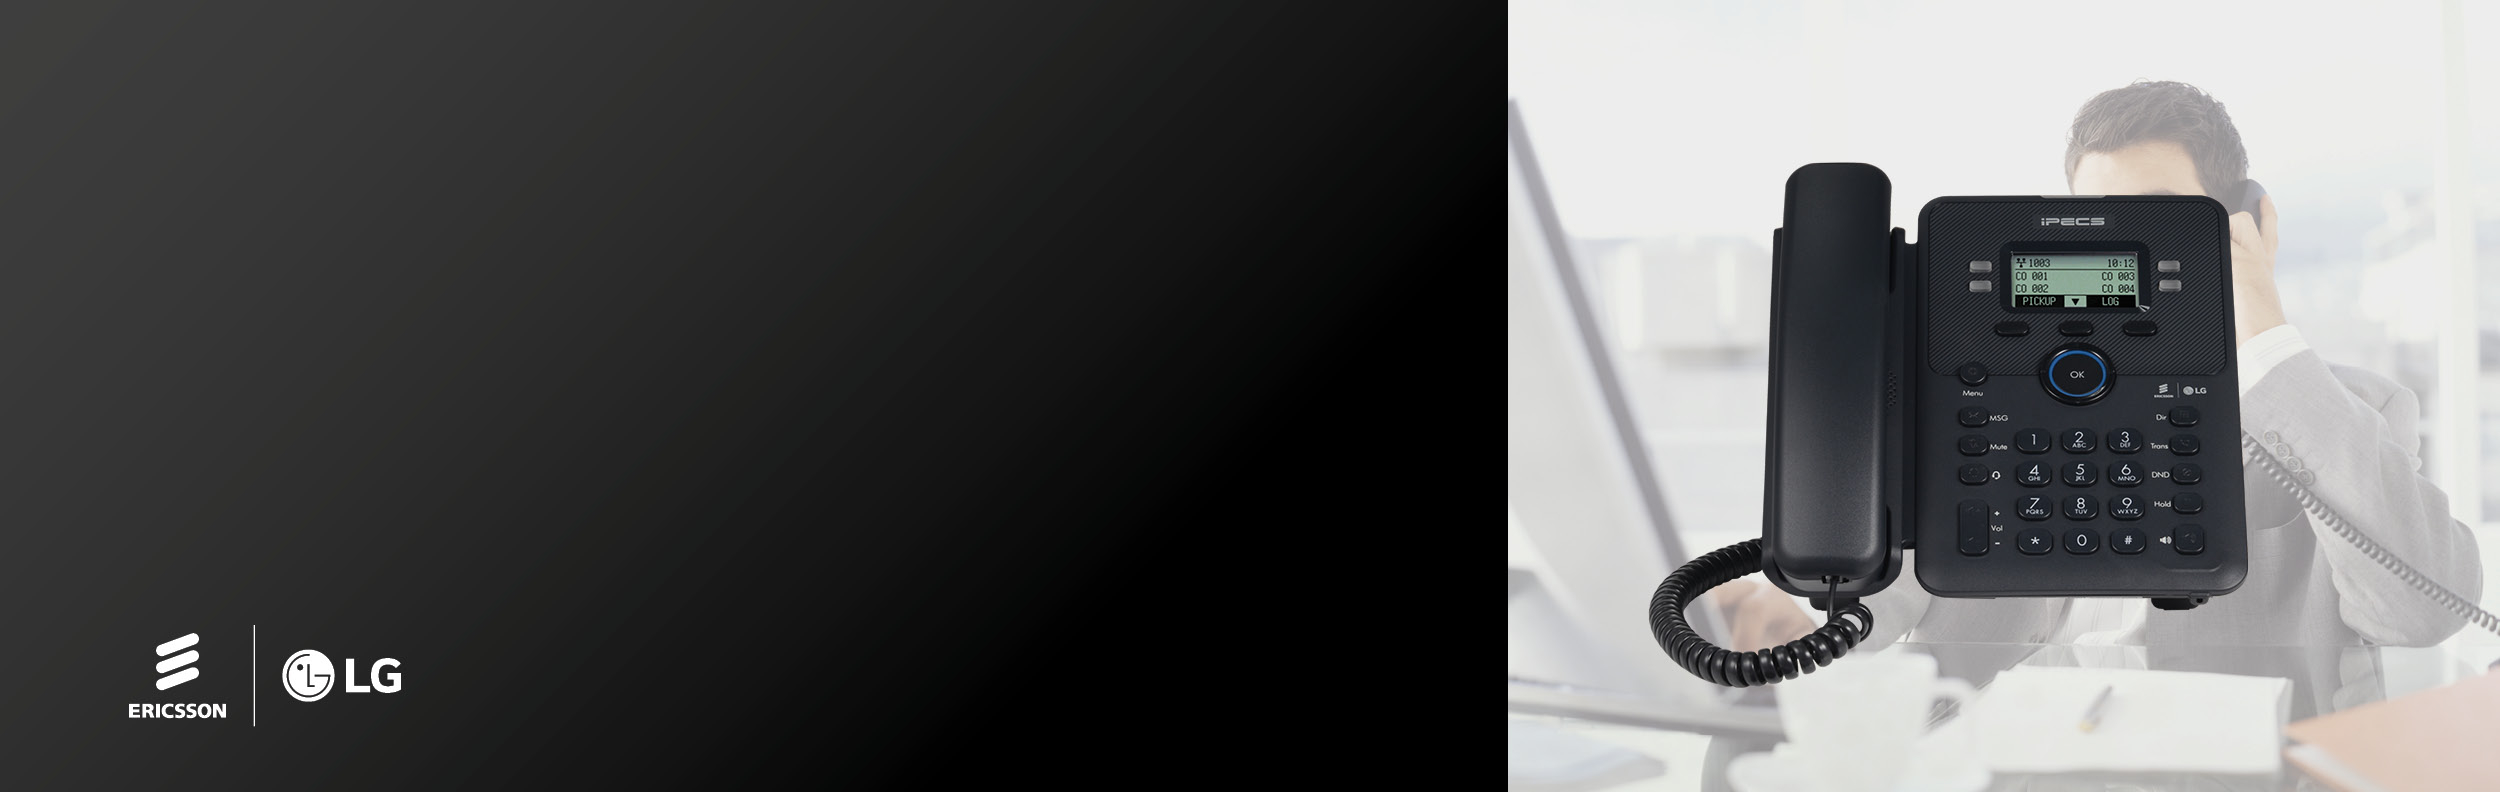 Ericsson-LG Phone Systems